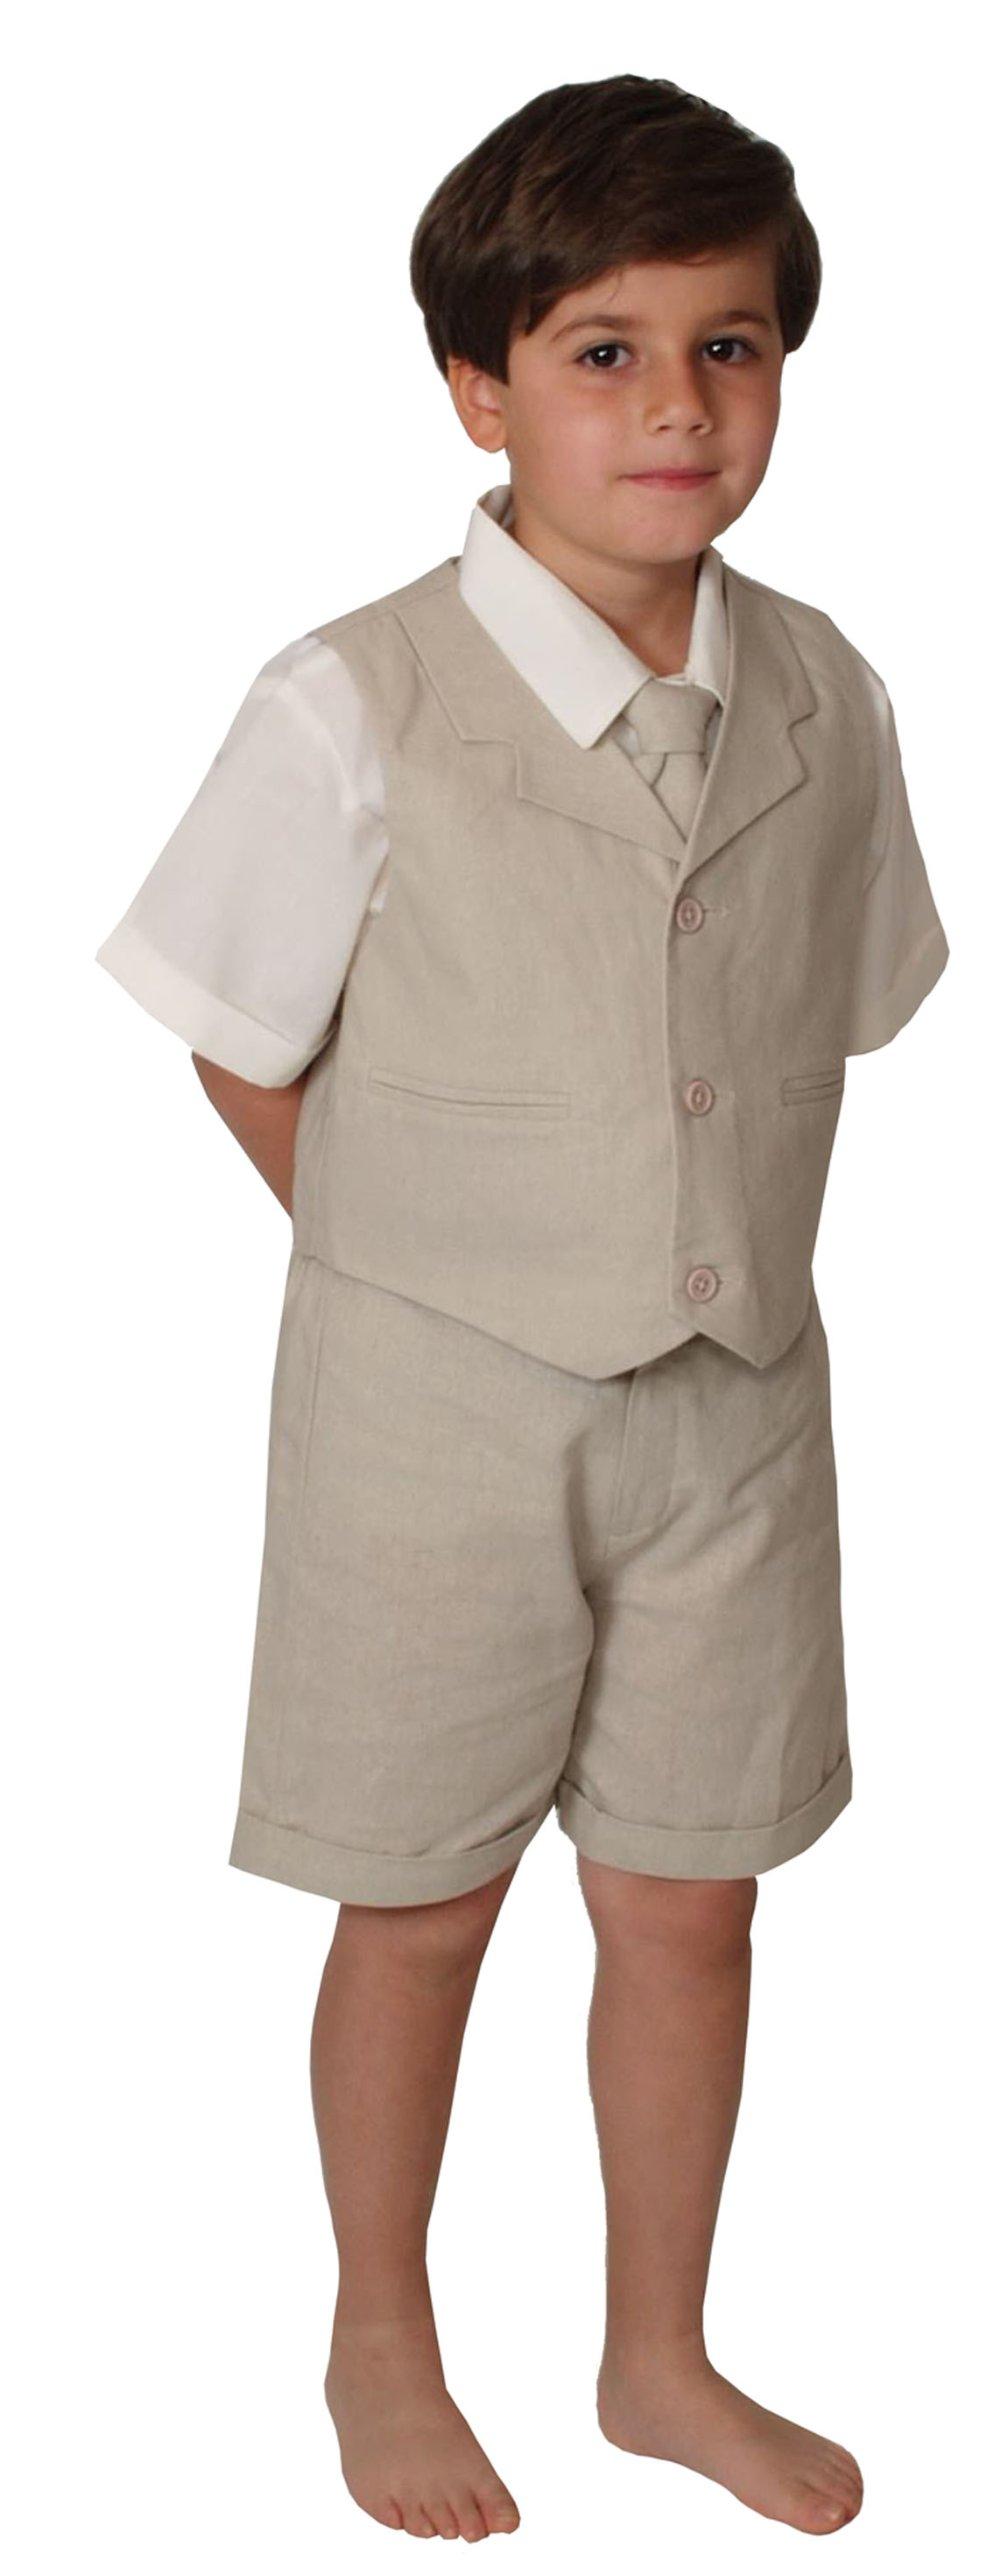 G266 SHORT SET Cotton/linen Blend Summer Suit Baby/Toddler (5, Natural)